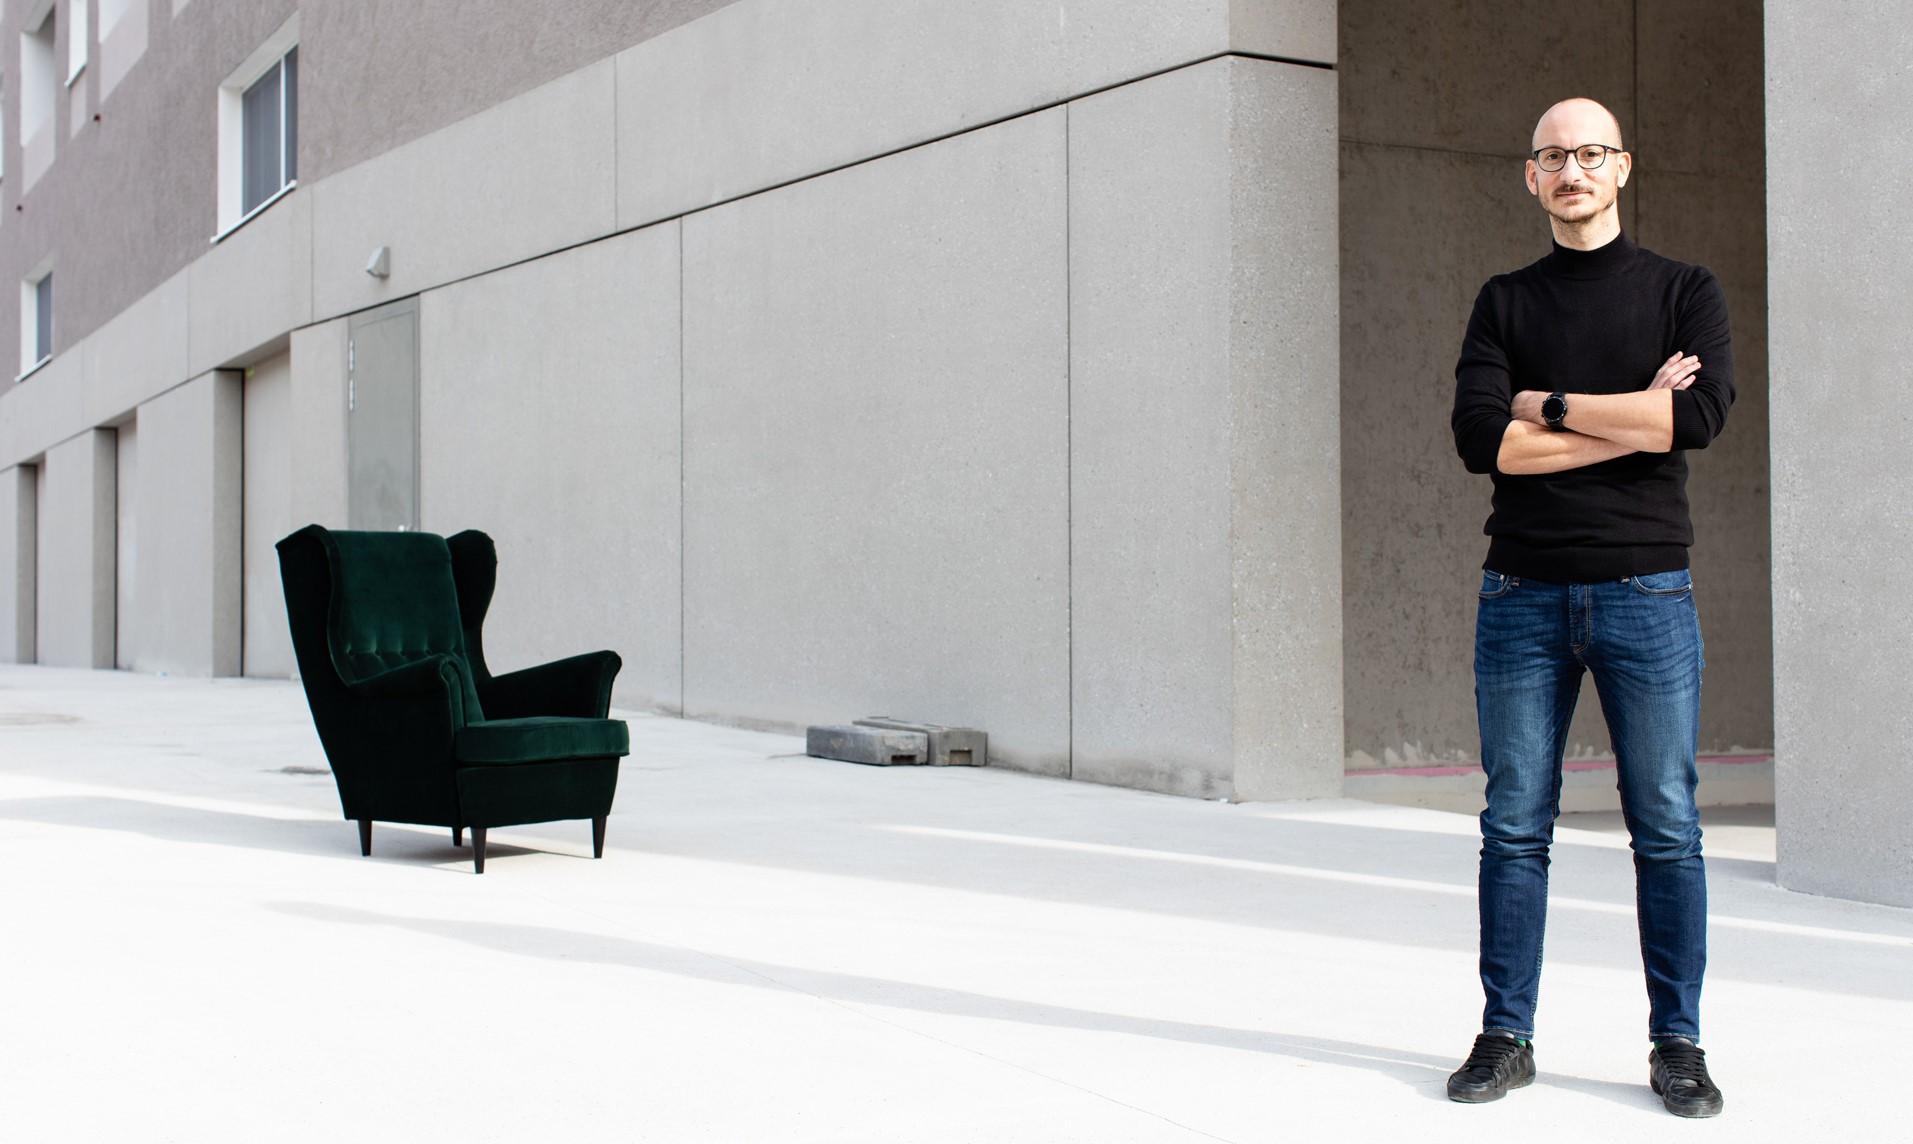 Dominik Kaltenberger | Supervision